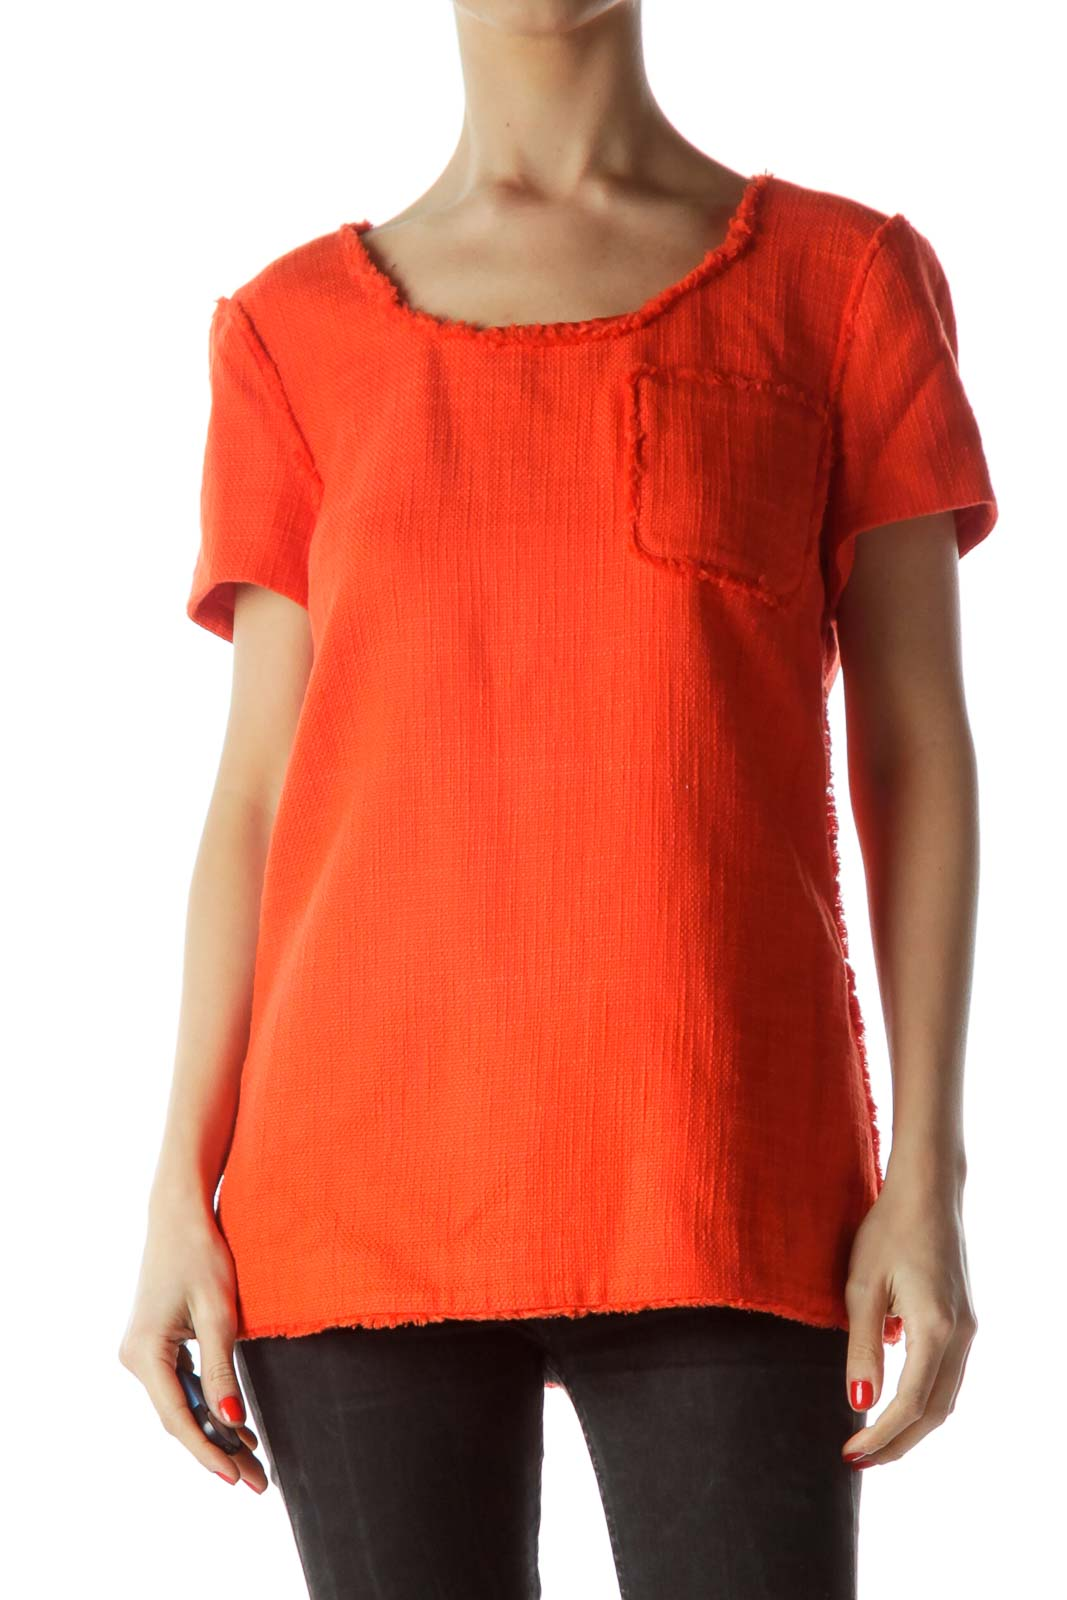 Orange Pocket Short Sleeve Textured Knit Top